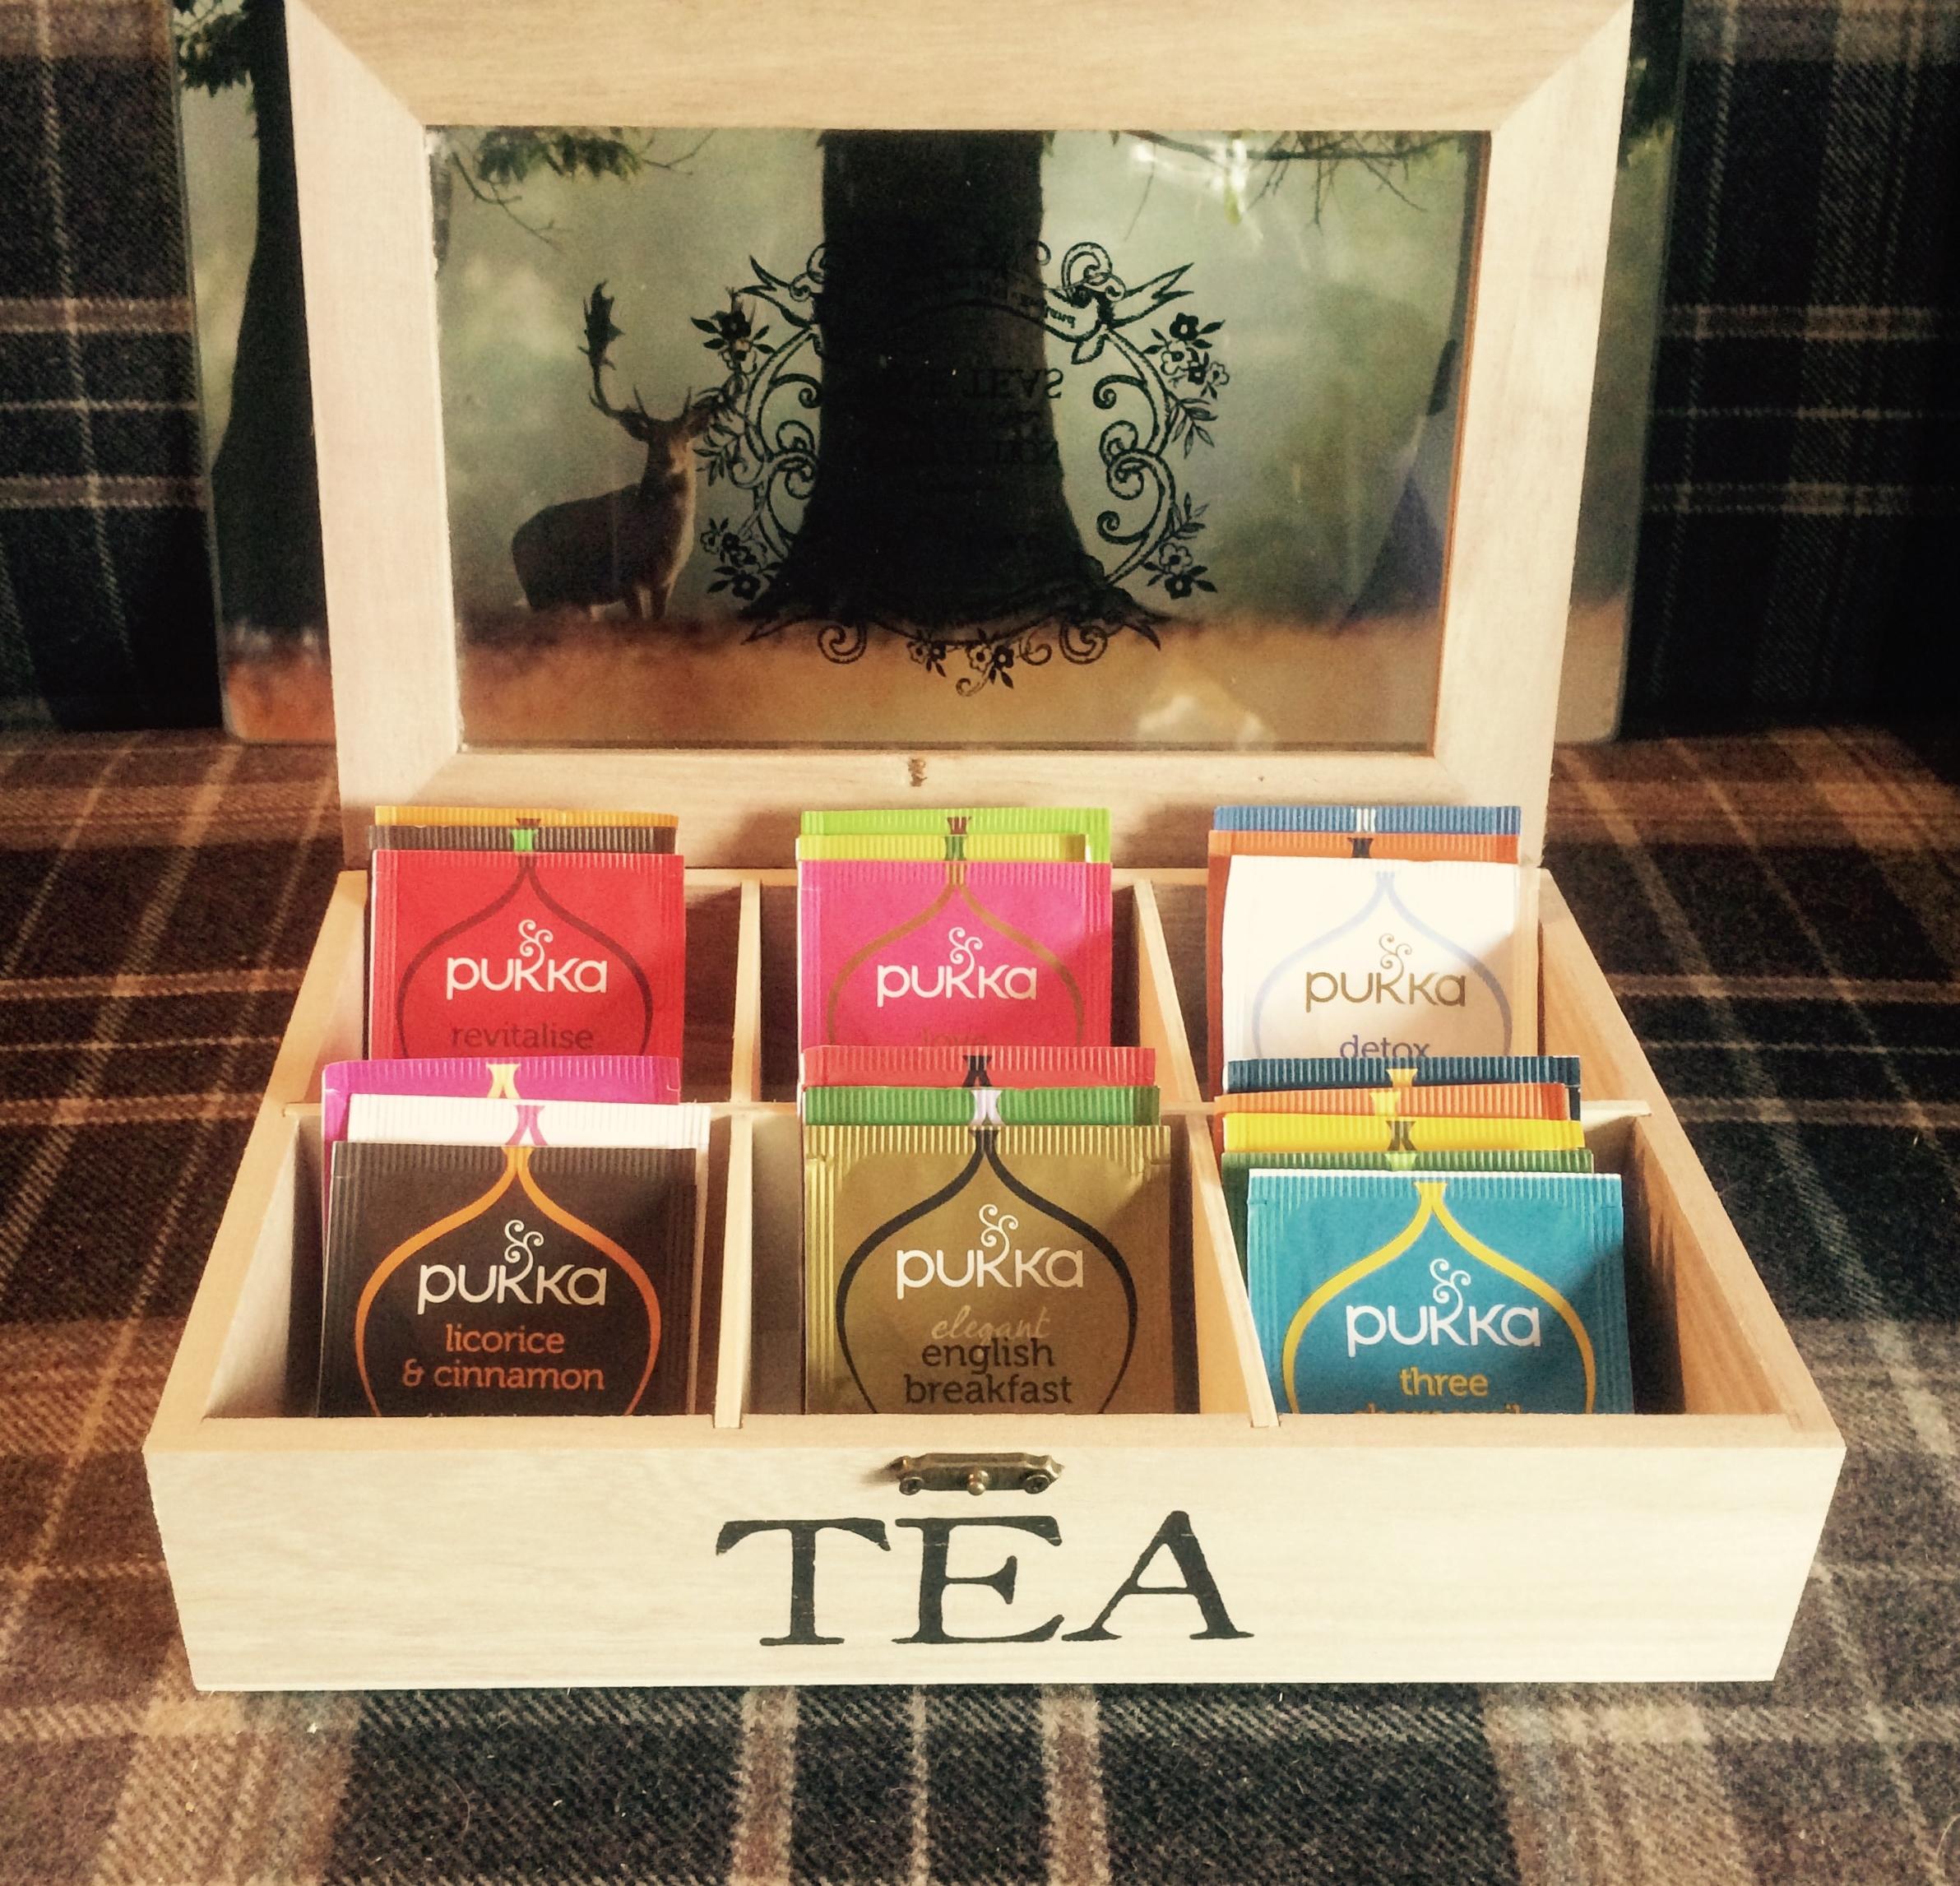 Free complimentary Pukka teas